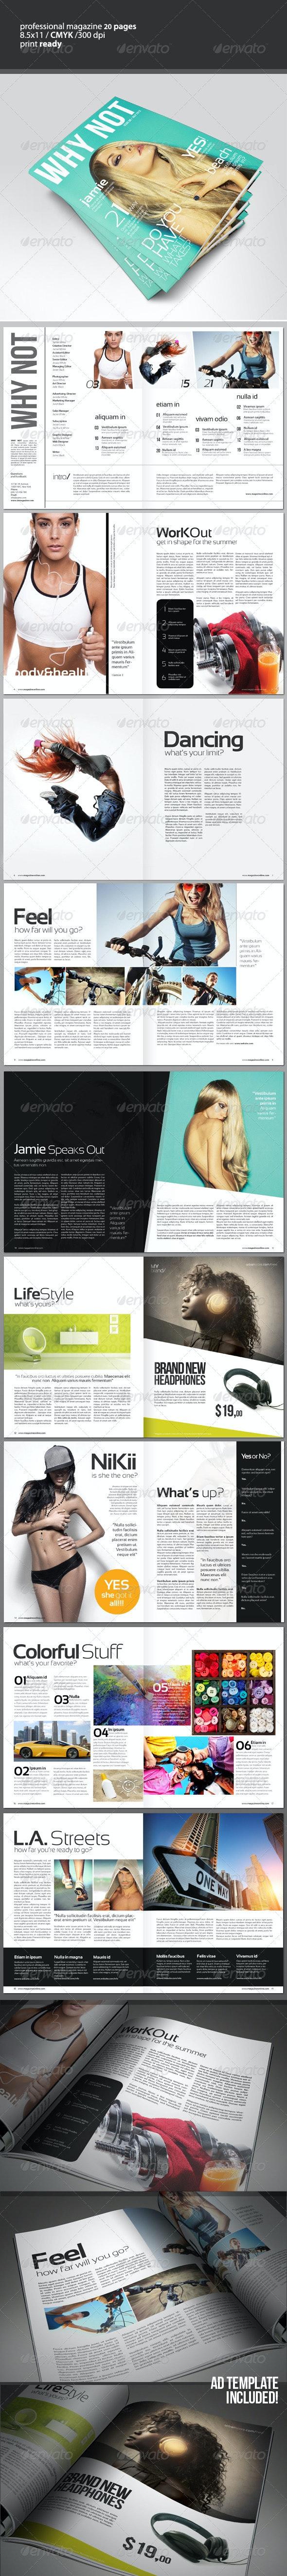 WHY NOT Magazine 2 sizes - Magazines Print Templates